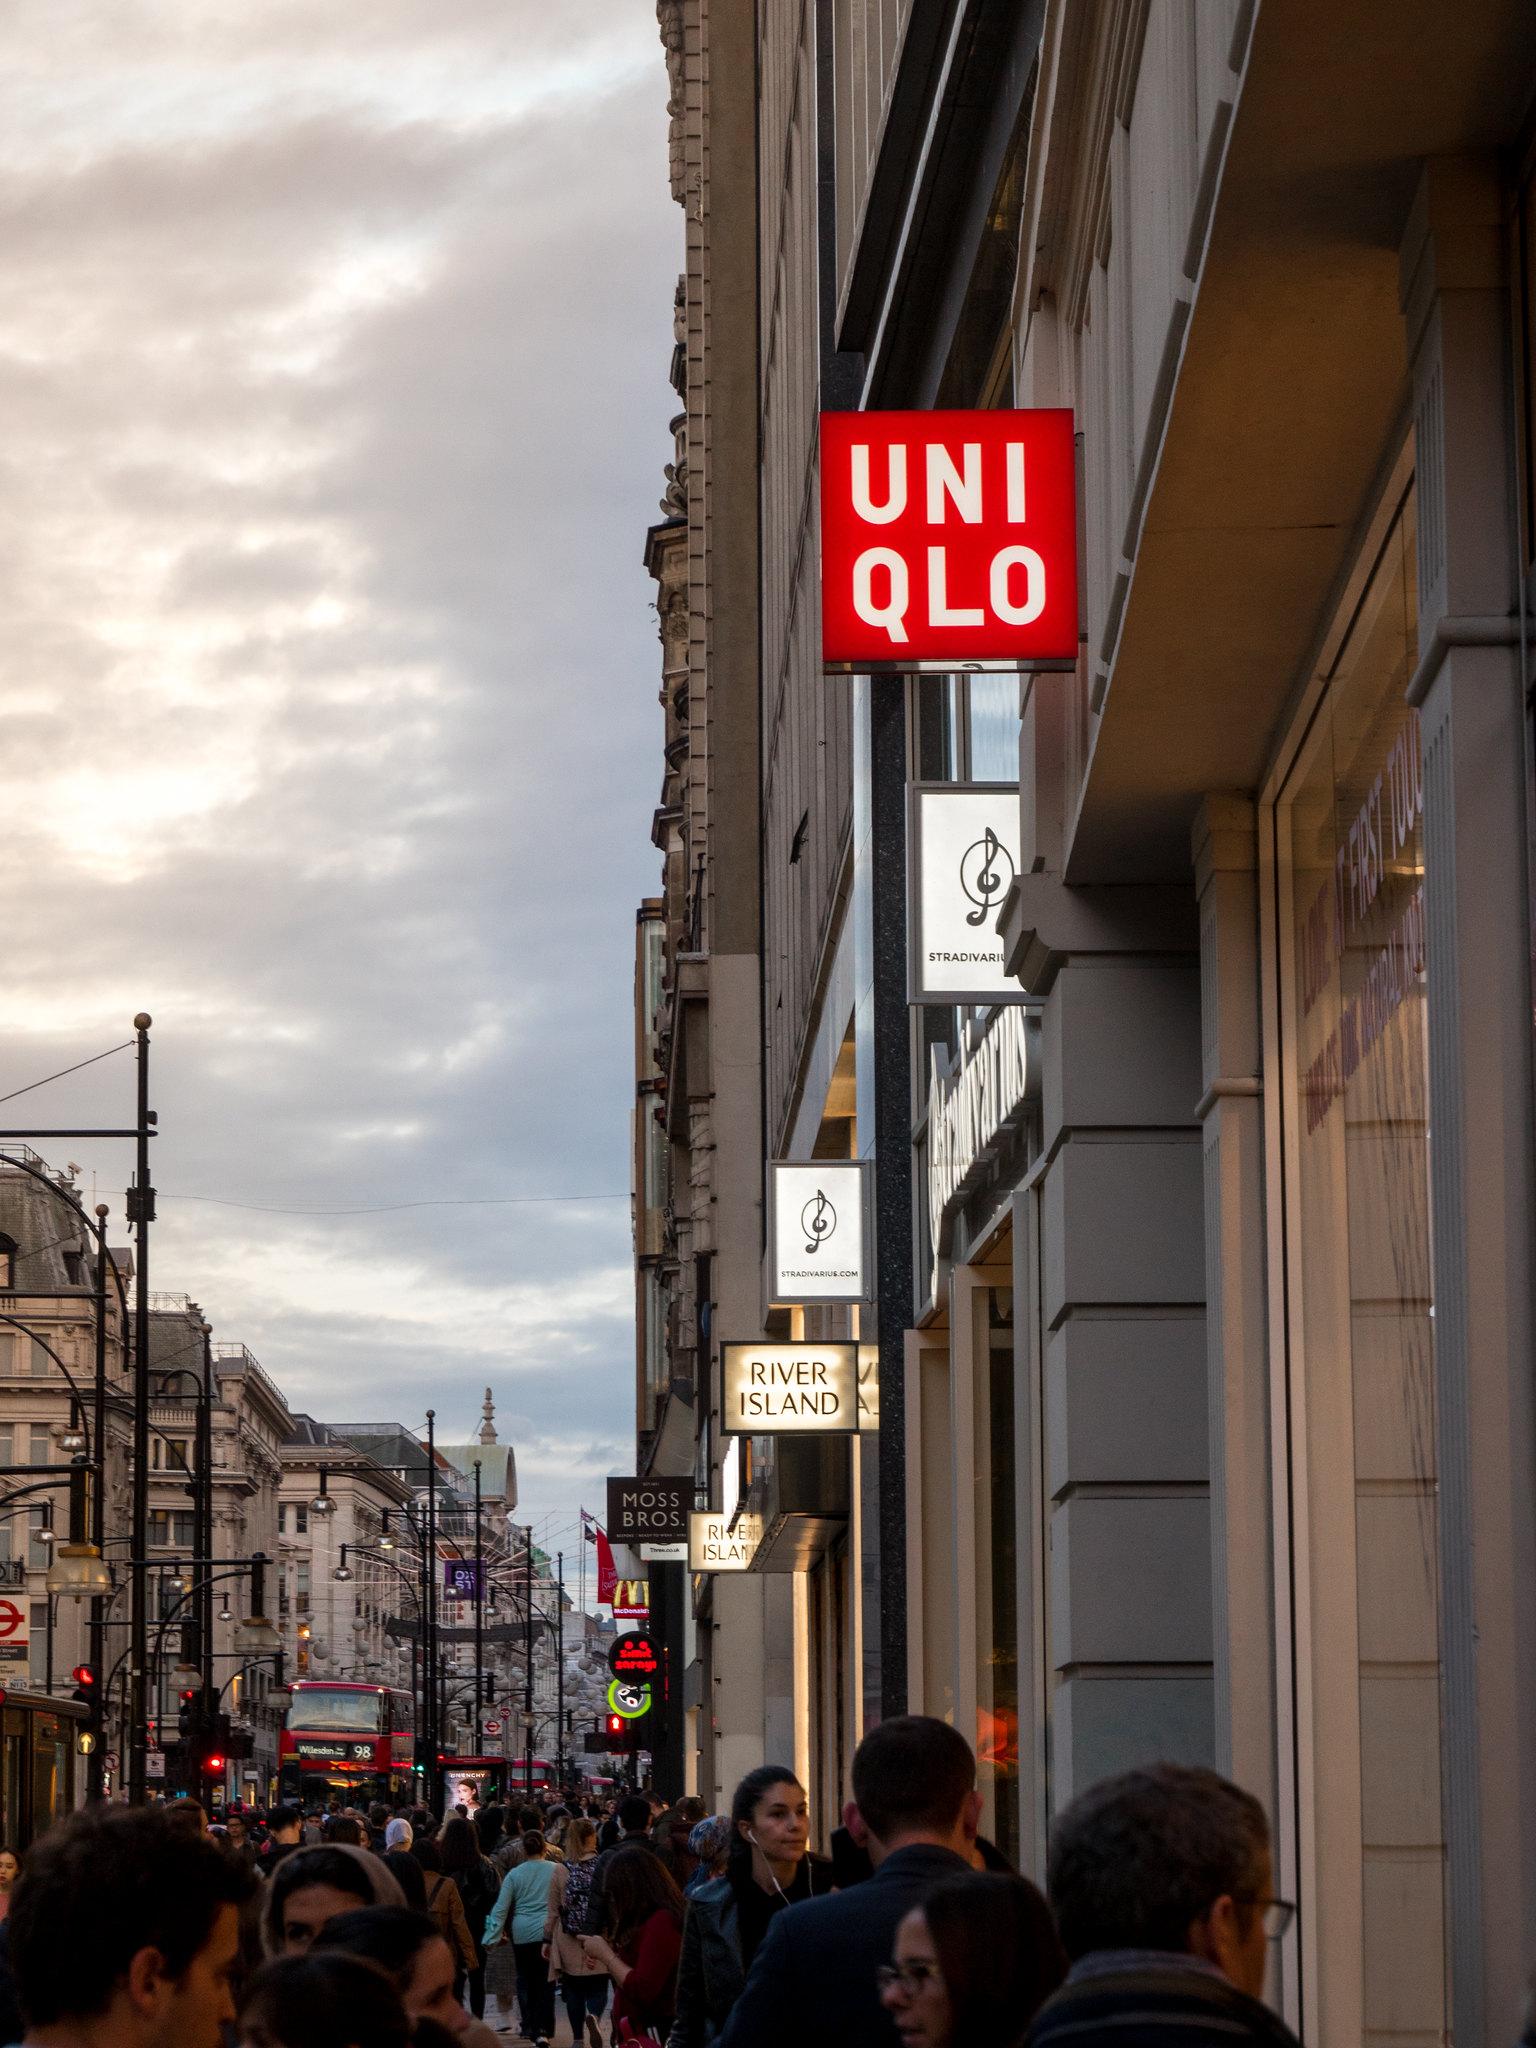 lontoo oxford street (9 of 10)